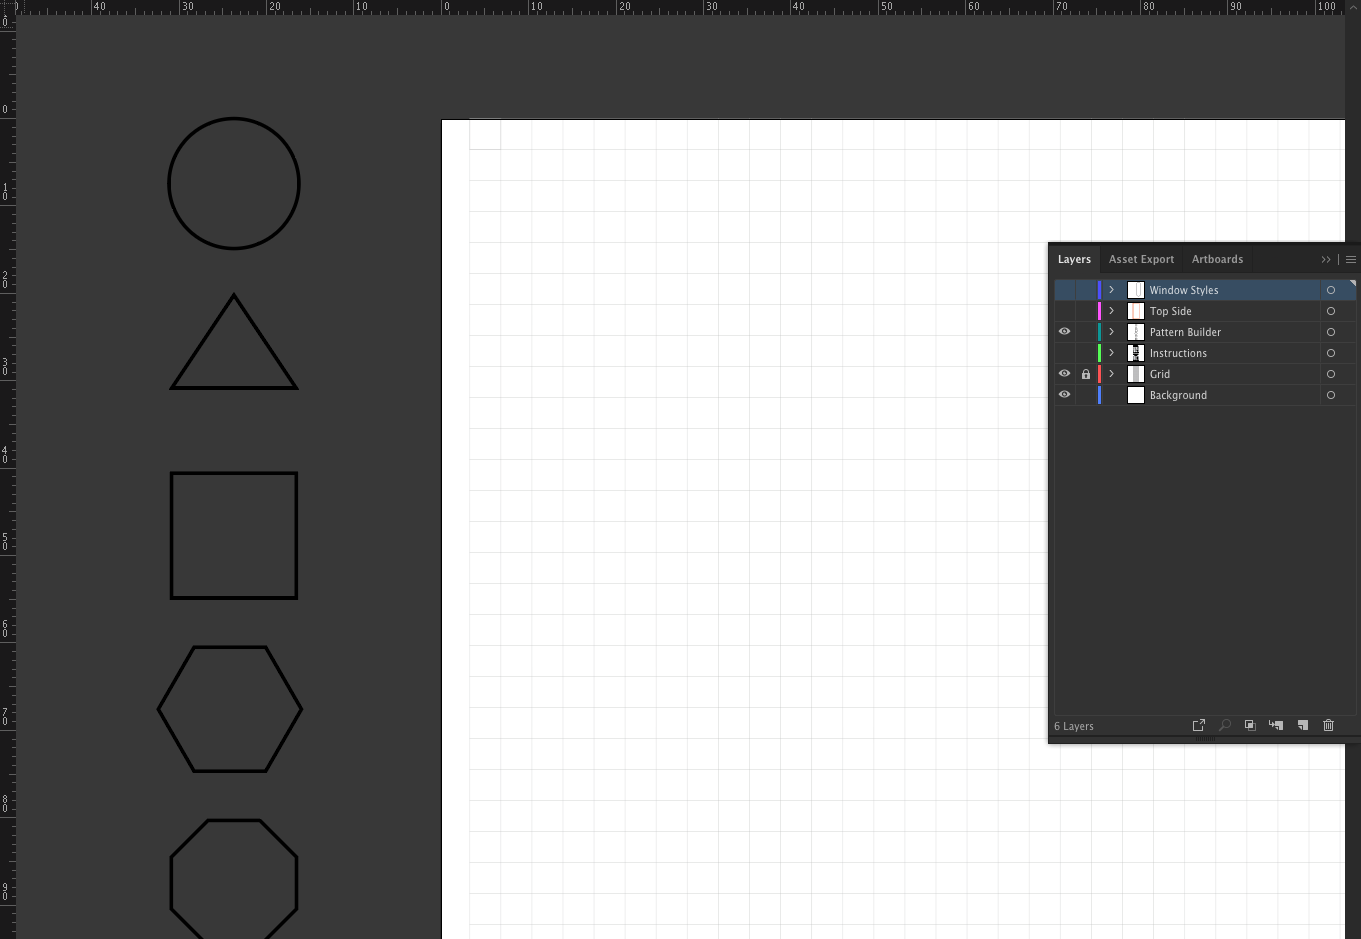 Pattern Builder Interface